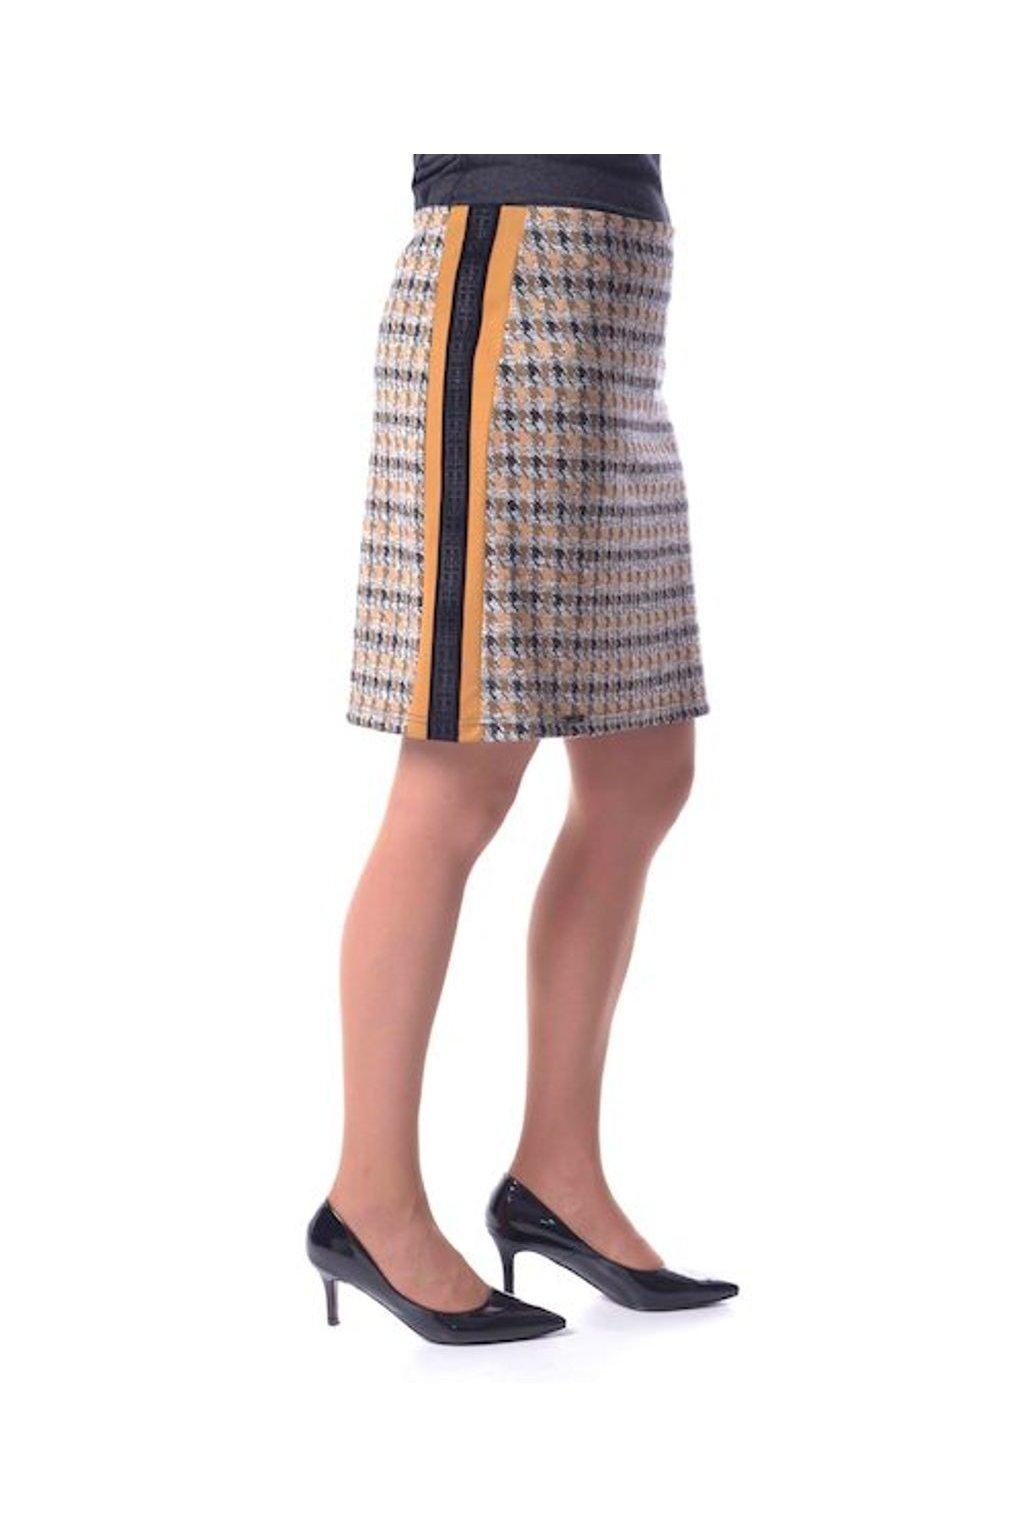 8120 Sukně Style vzory (Velikost 36, Barva Vzorovaná)